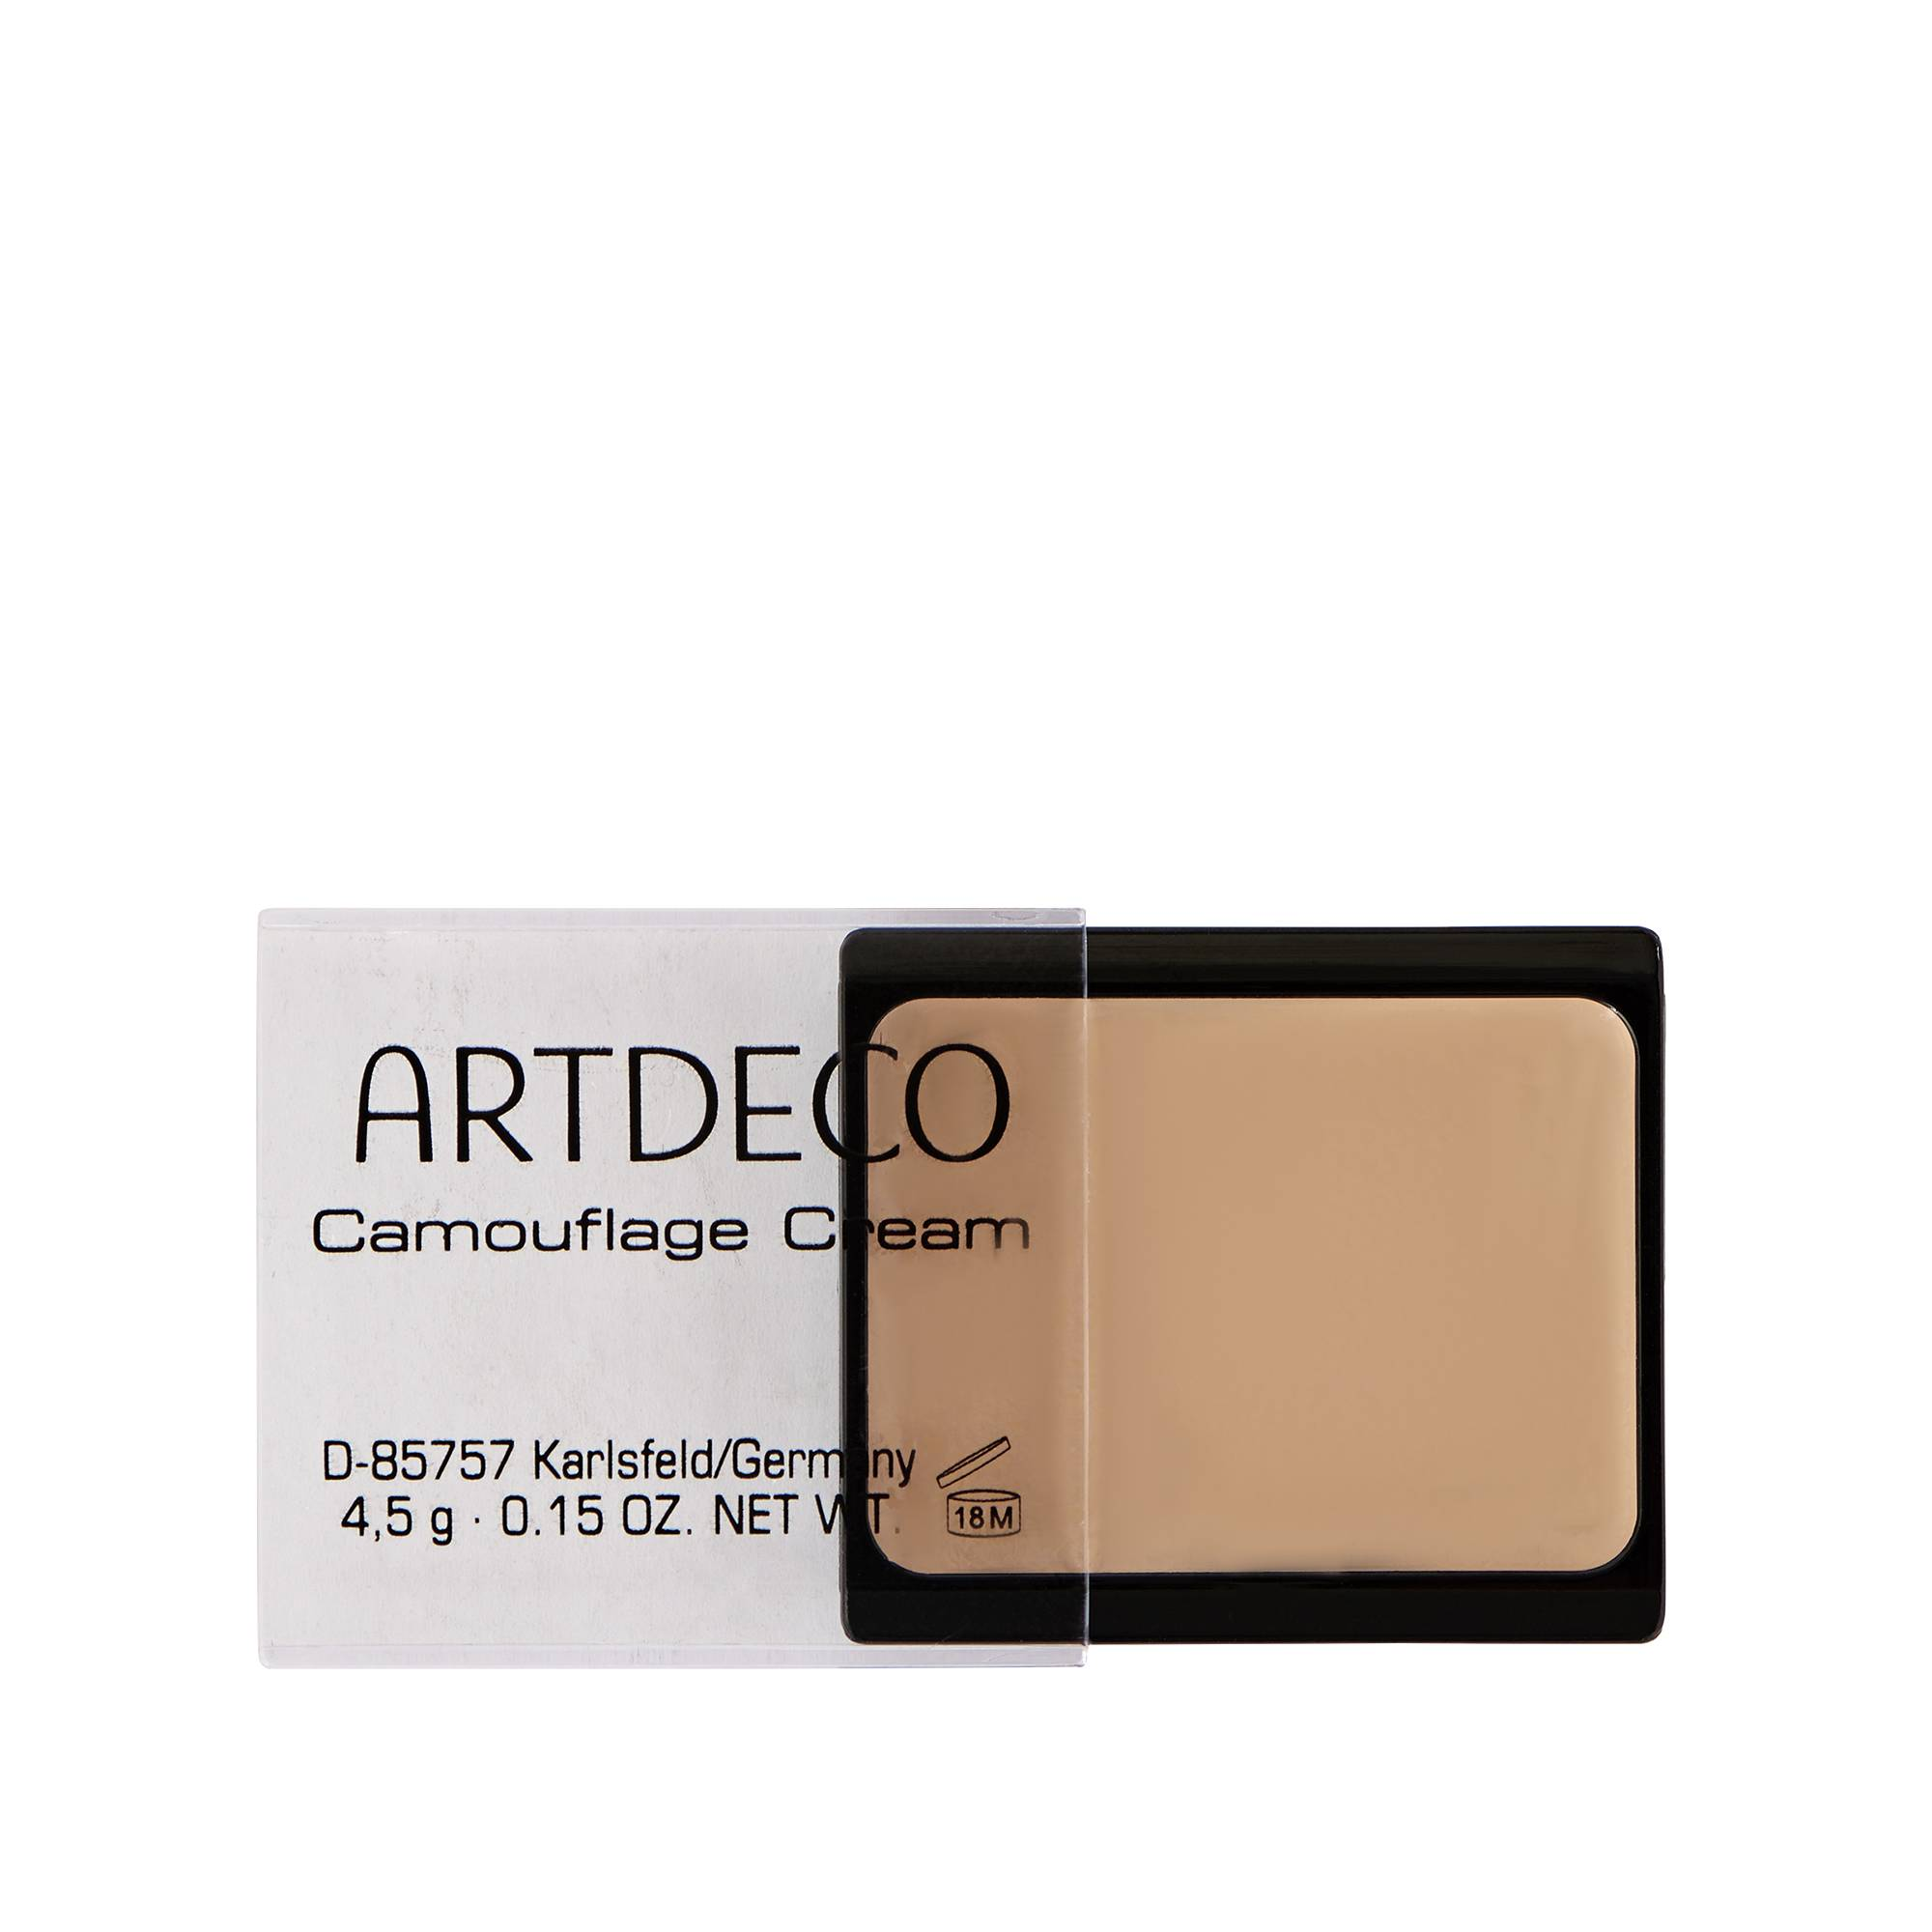 ARTDECO Crème camouflage 06 Sable du désert 03 Iced Coffee 4.5g